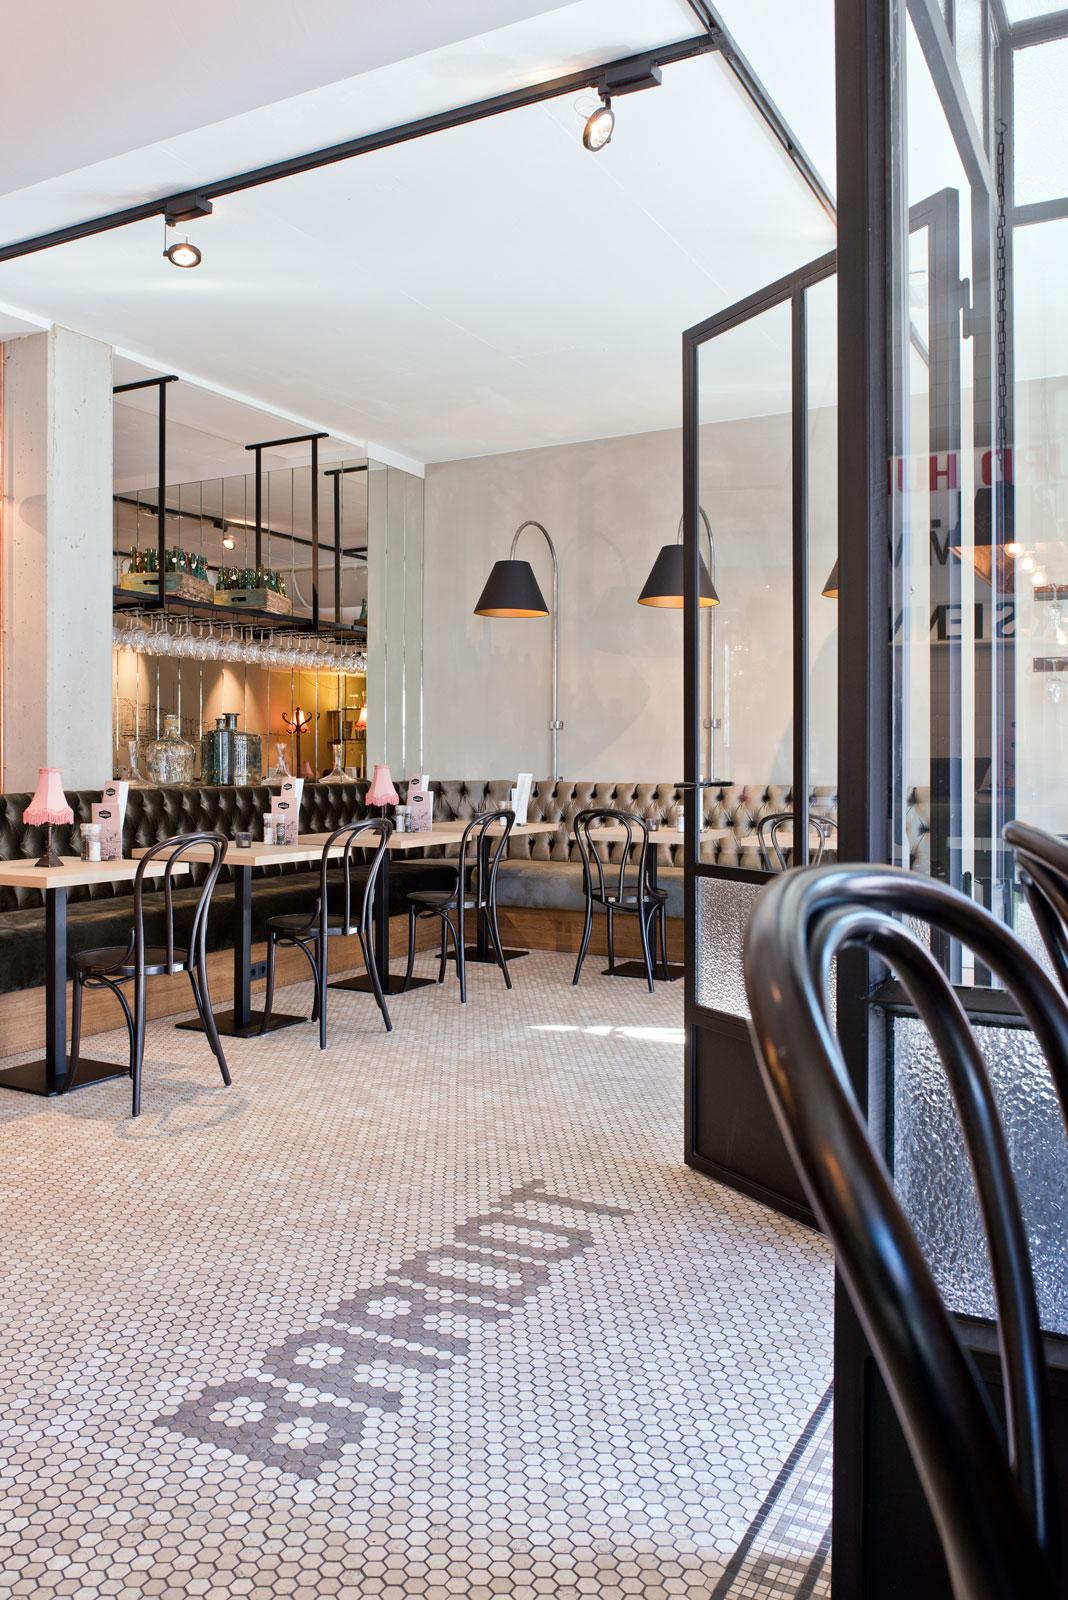 8cb5f3ab b714 4aa5 a4e6 f8303645898a dsc0025 copy Brasserie Bardot Restaurant